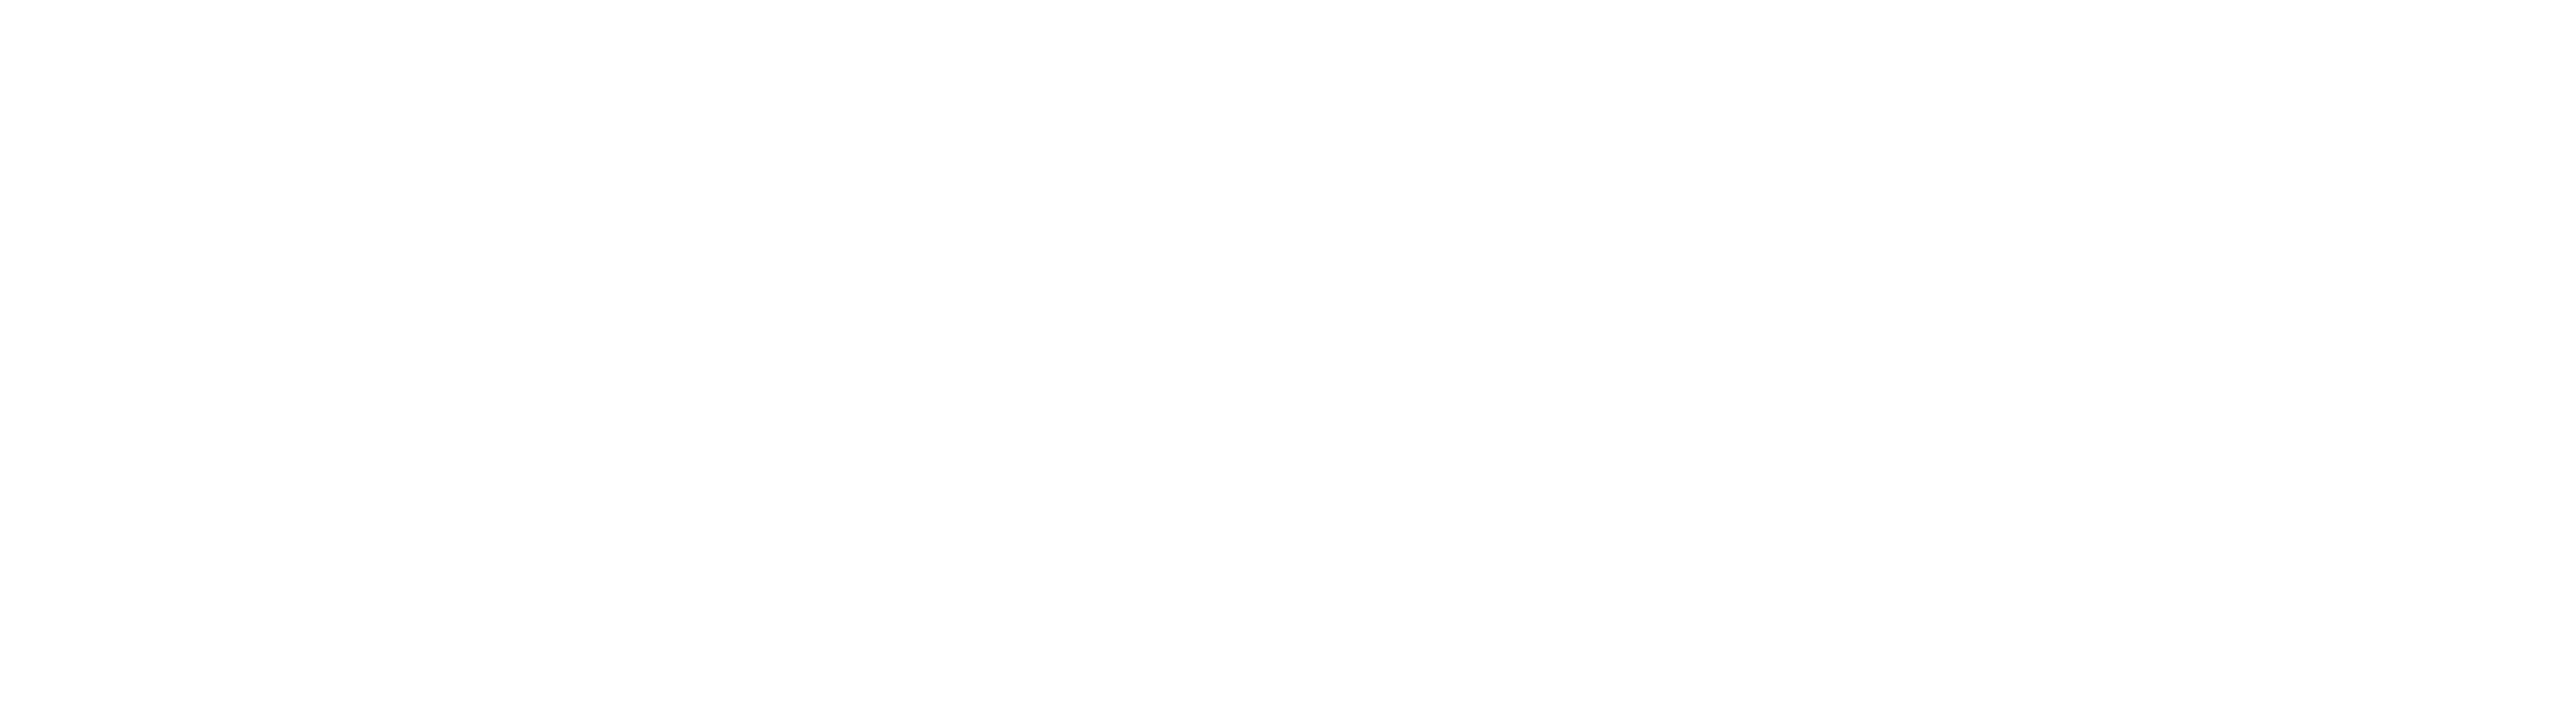 FritzFit - Personal Training Rosenheim